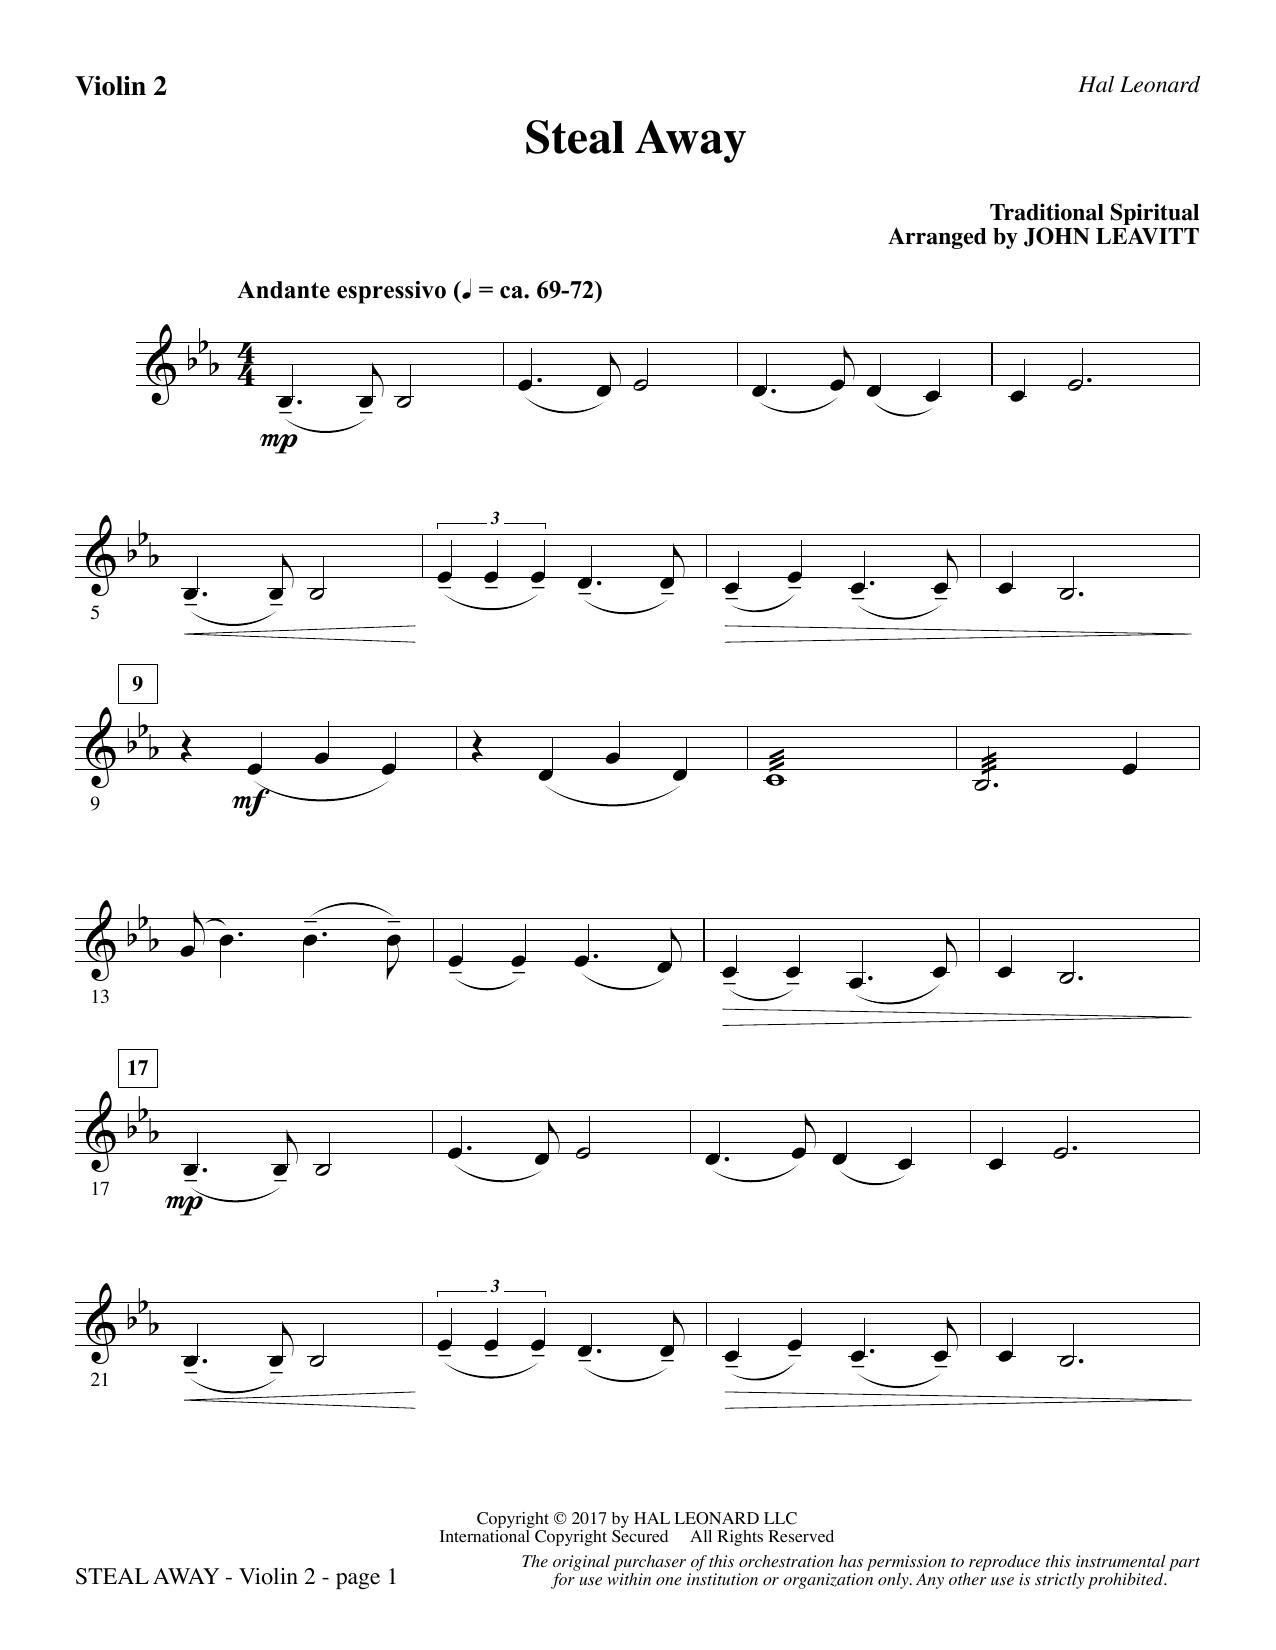 John Leavitt Steal Away - Violin 2 sheet music notes and chords. Download Printable PDF.